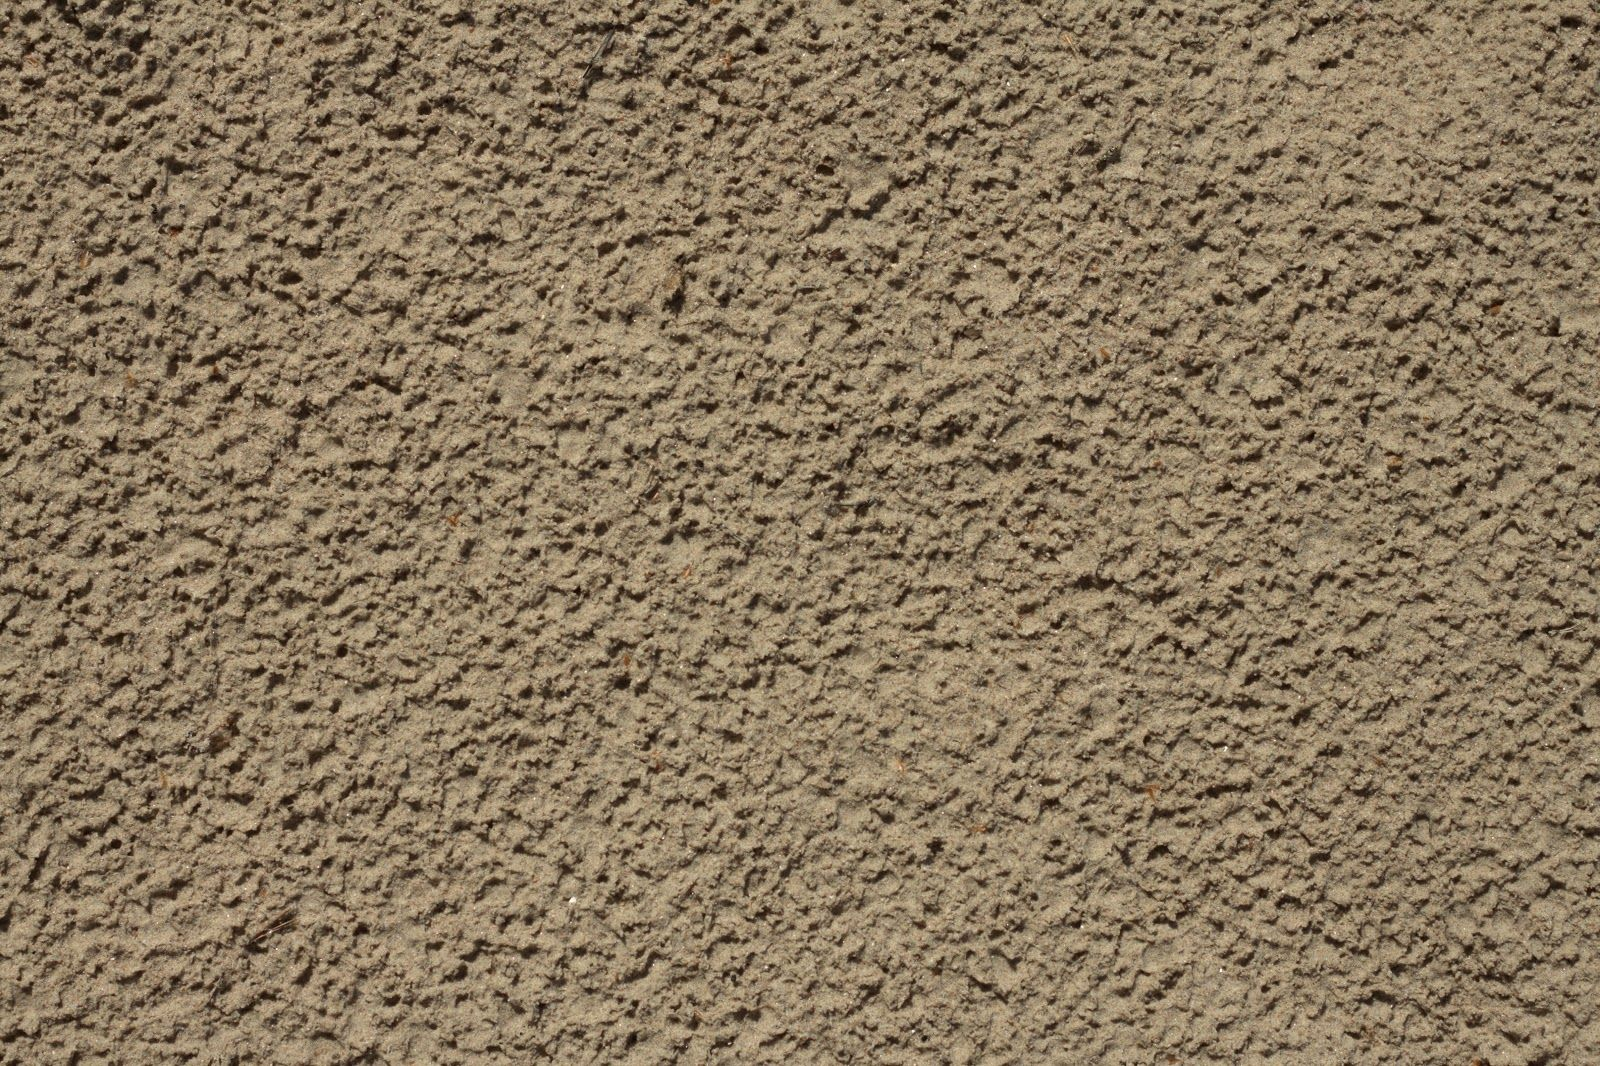 Sand 2 Beach Soil Ground Shore Desert Texture Soil Texture Deserts Texture